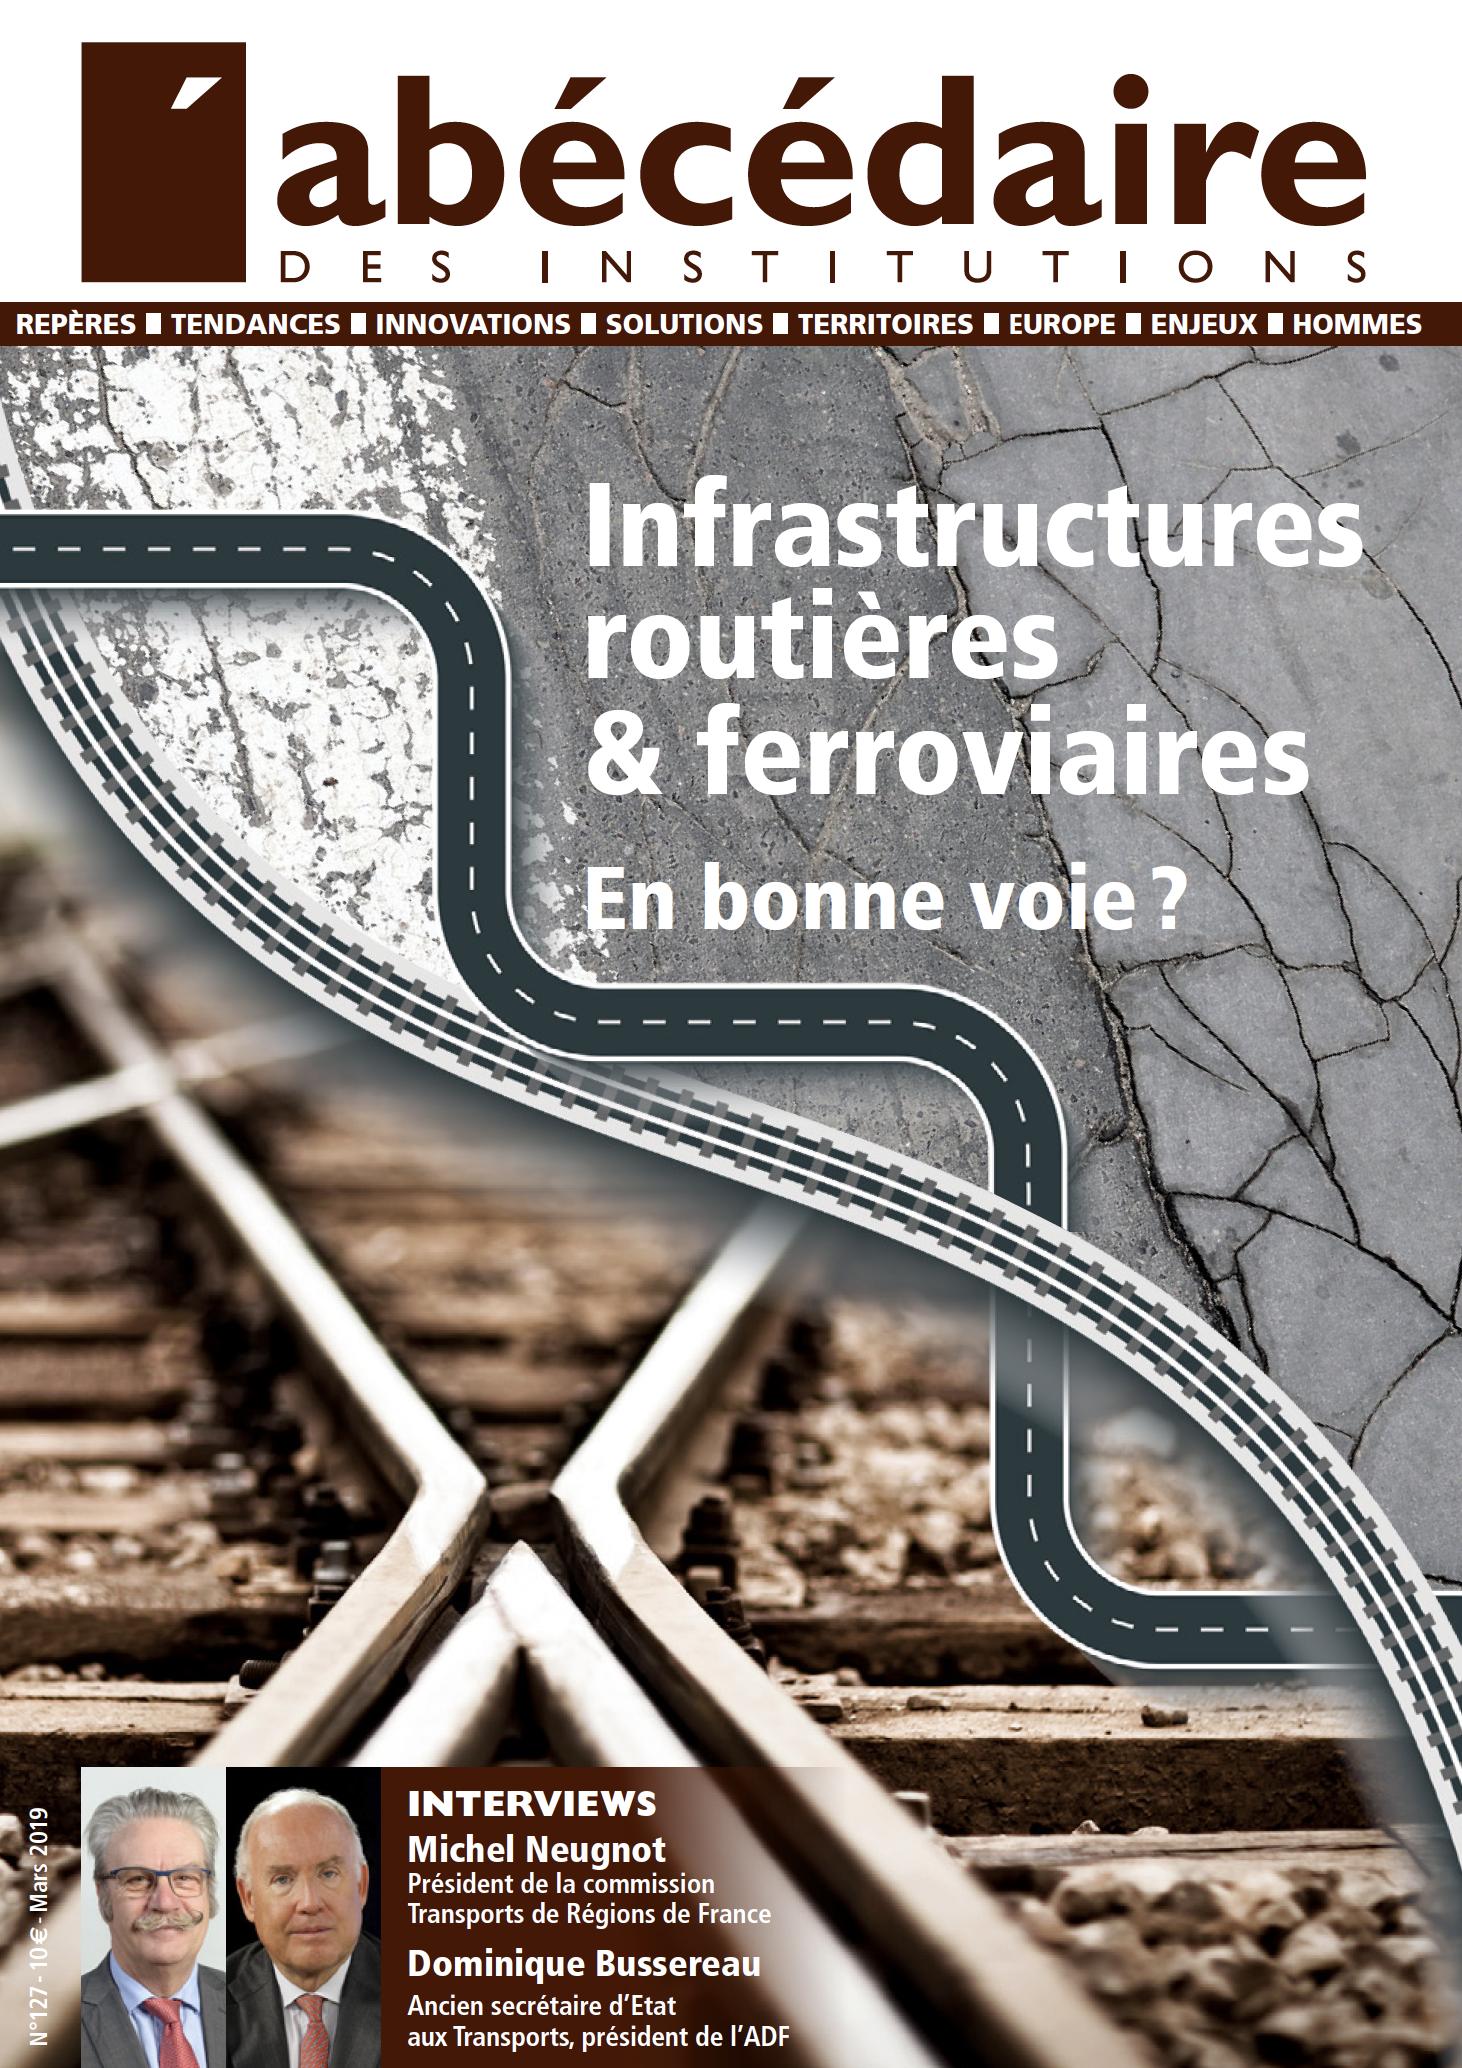 Infrastructures routières & ferroviaires